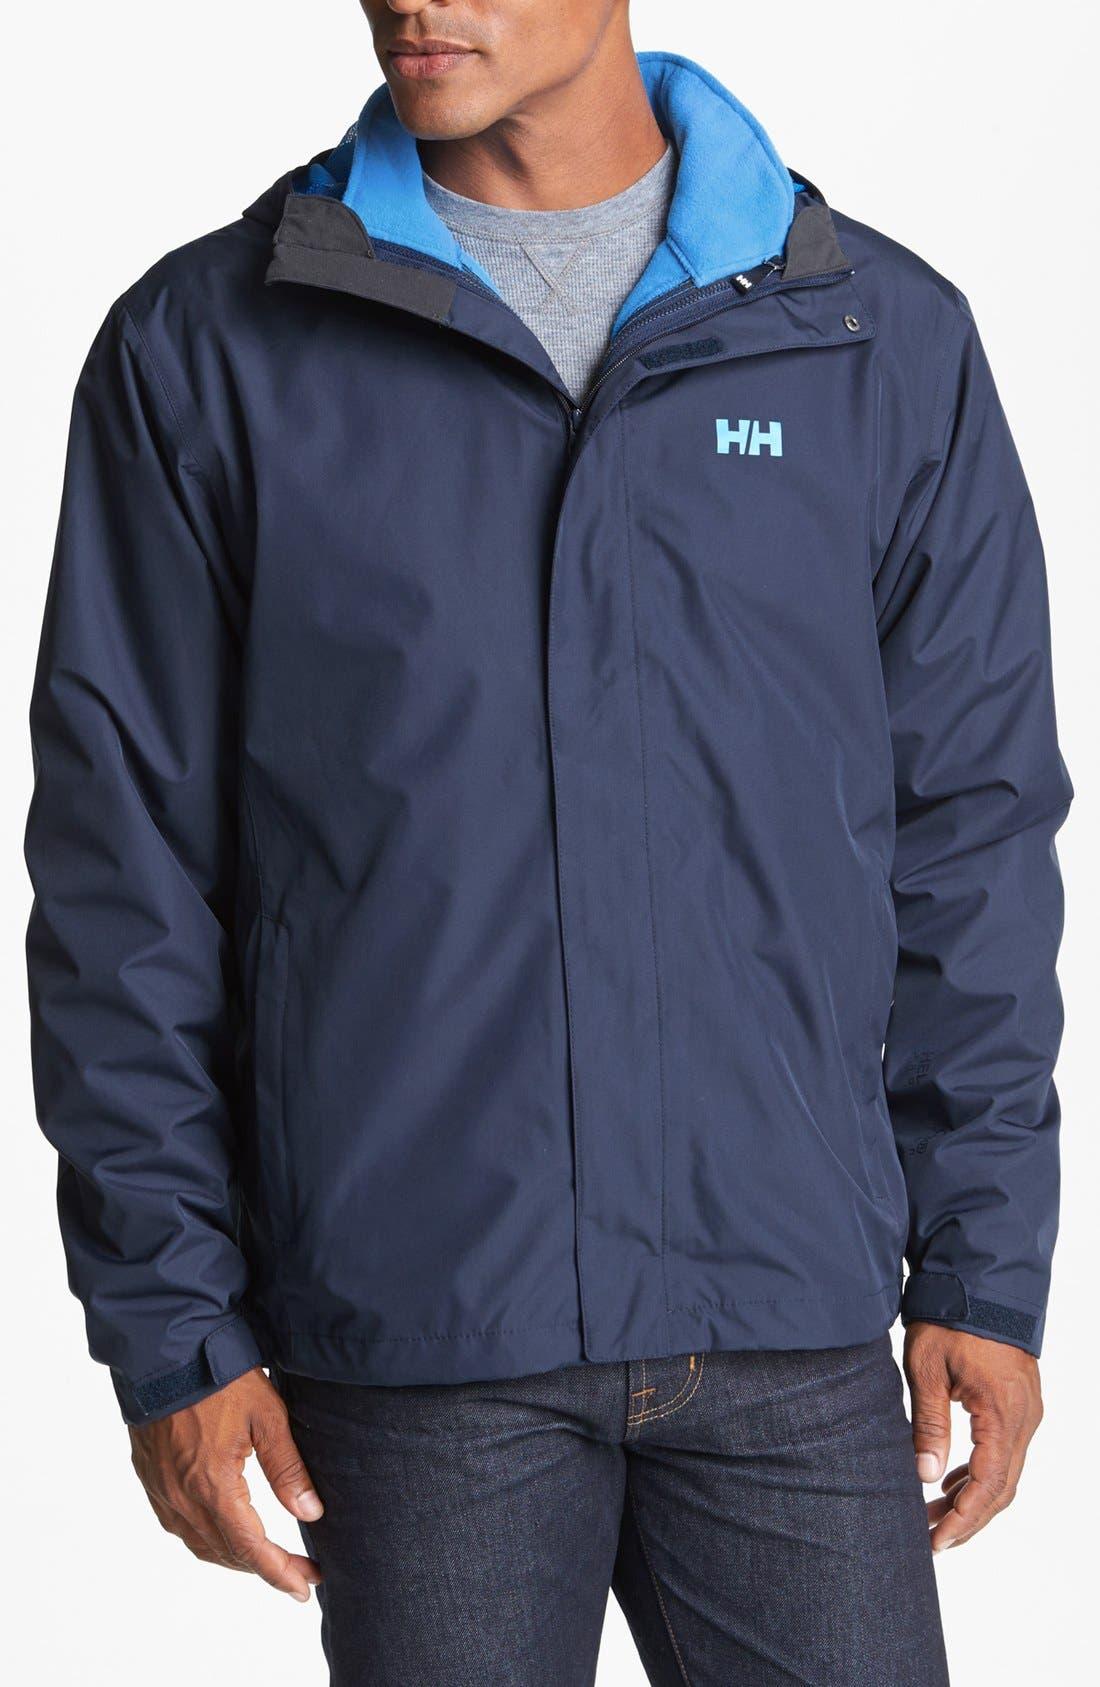 Alternate Image 1 Selected - Helly Hansen 'Seven J' 3-in-1 Jacket